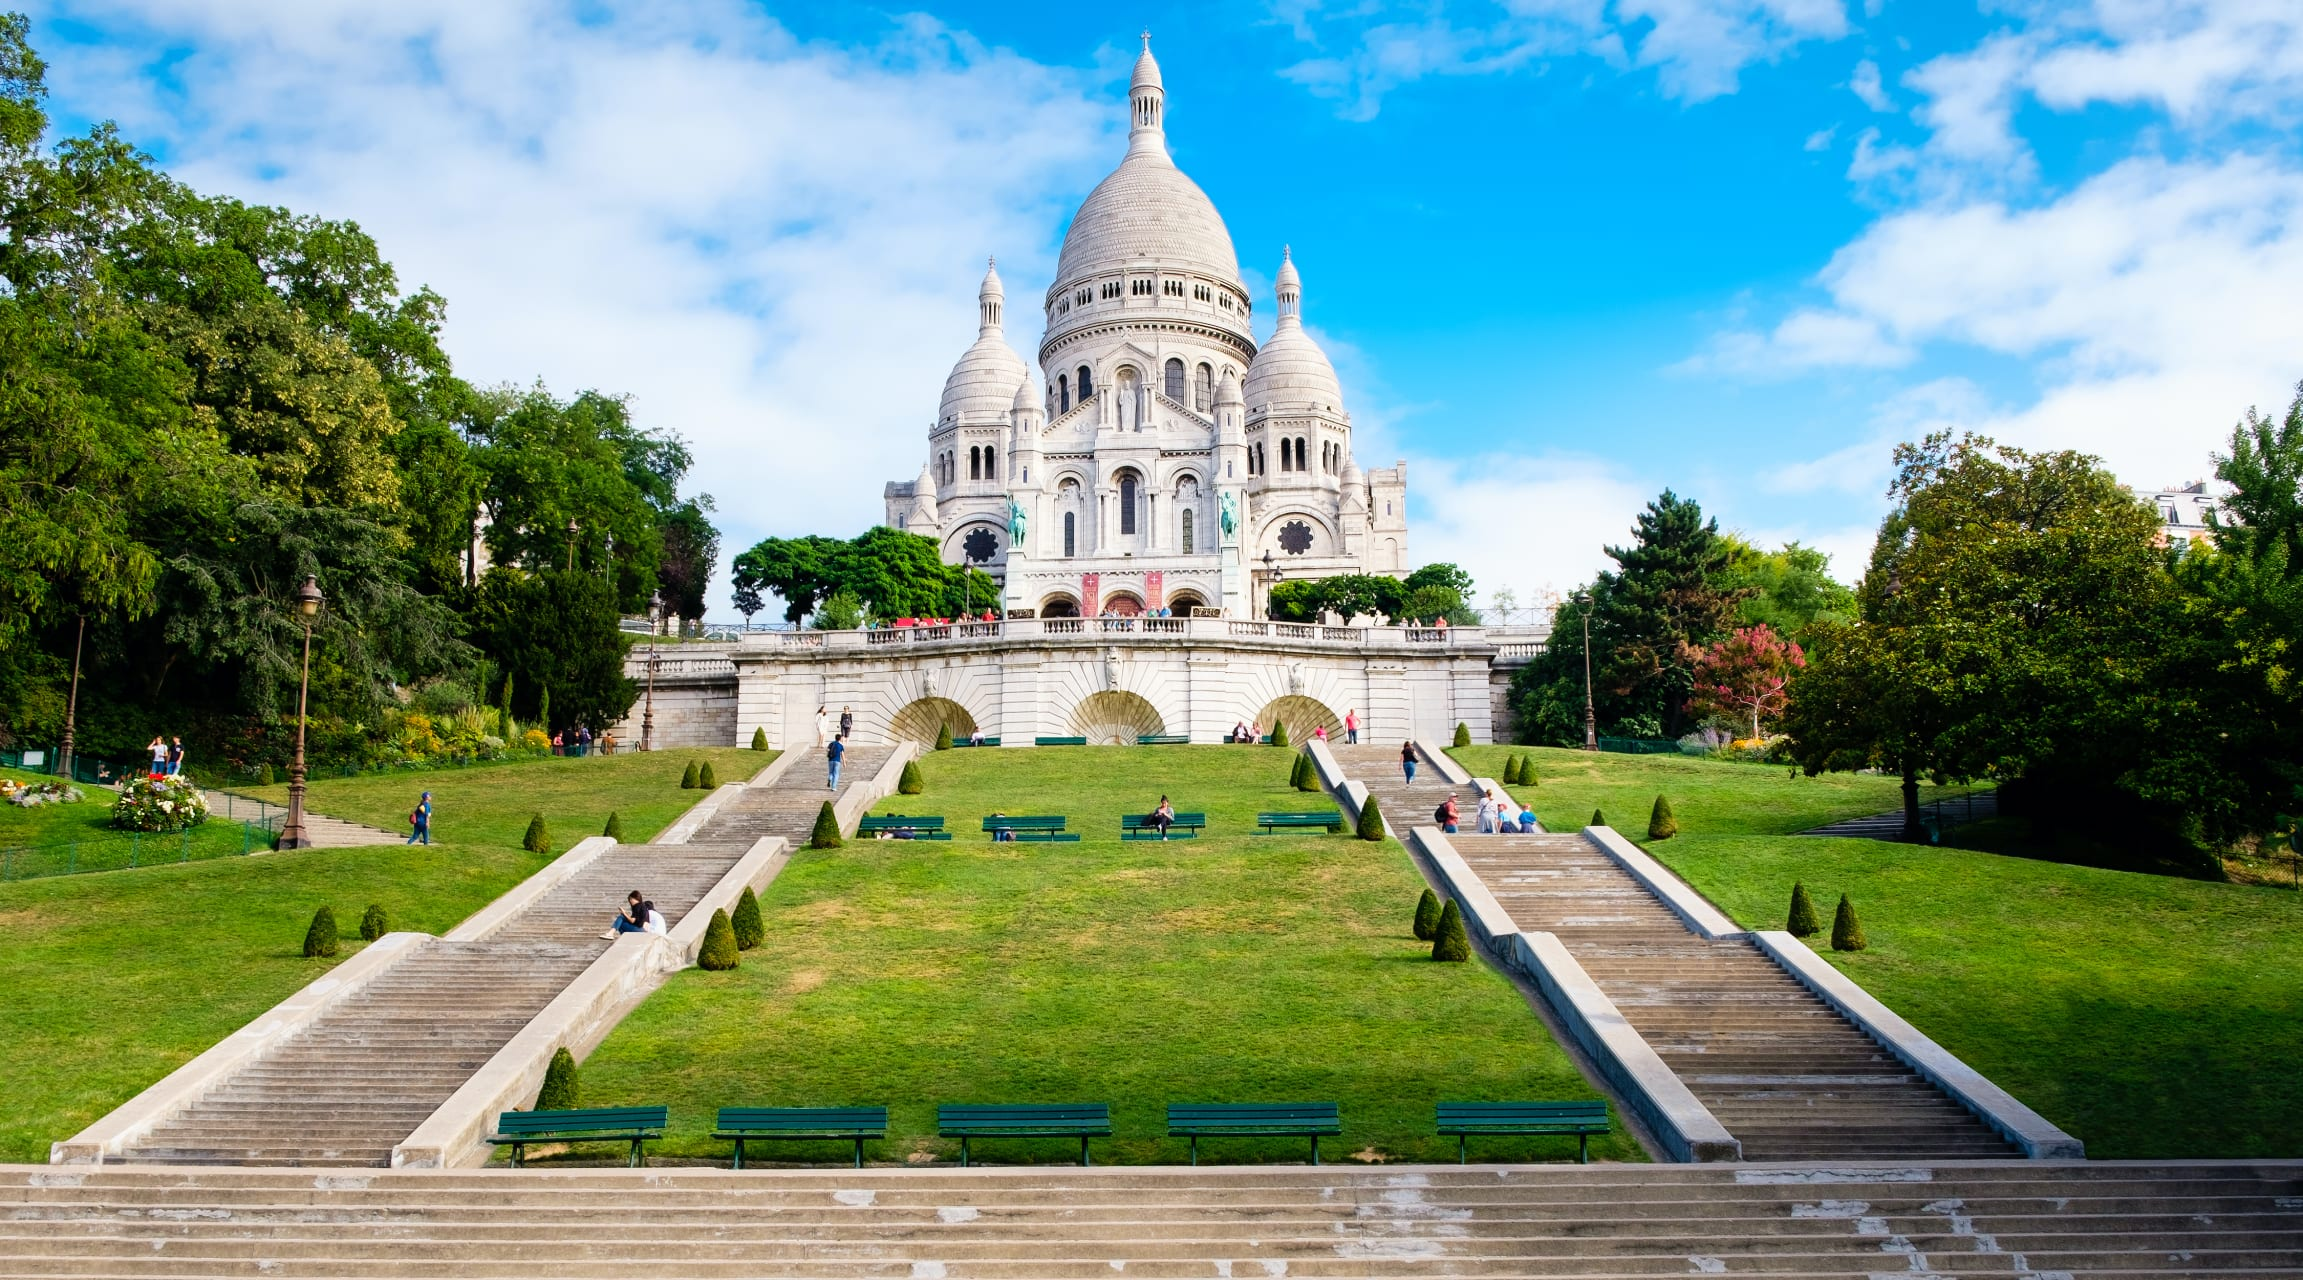 Paris - 10 Most Incredible Churches In Paris: N°9 Basilica of the Sacred Heart